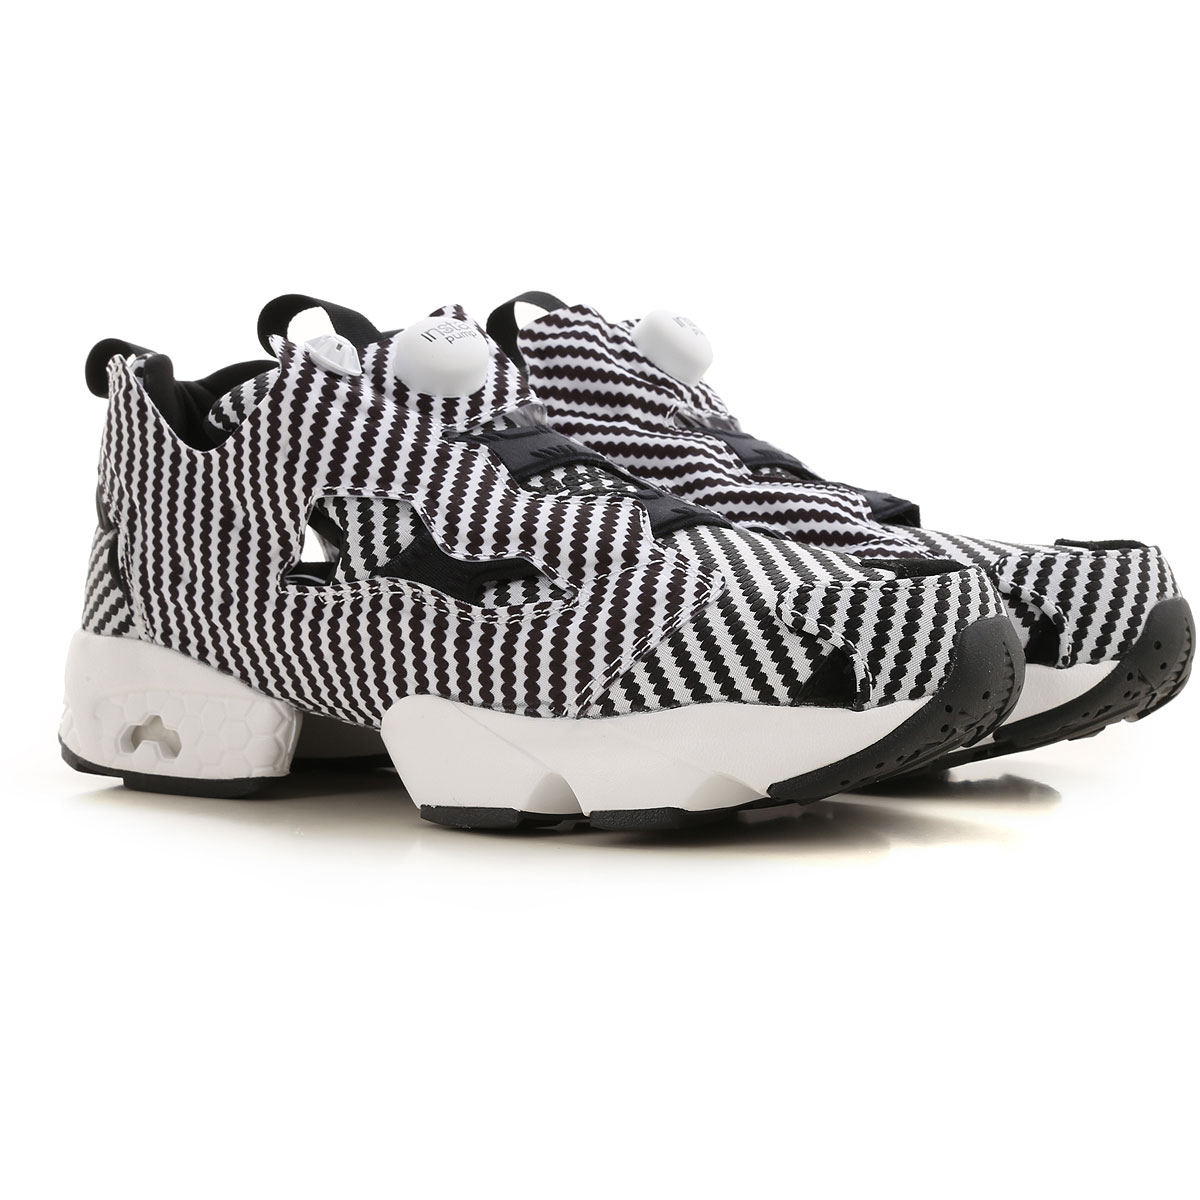 Reebok Sneakers for Men On Sale, Black, Nylon, 2019, 9